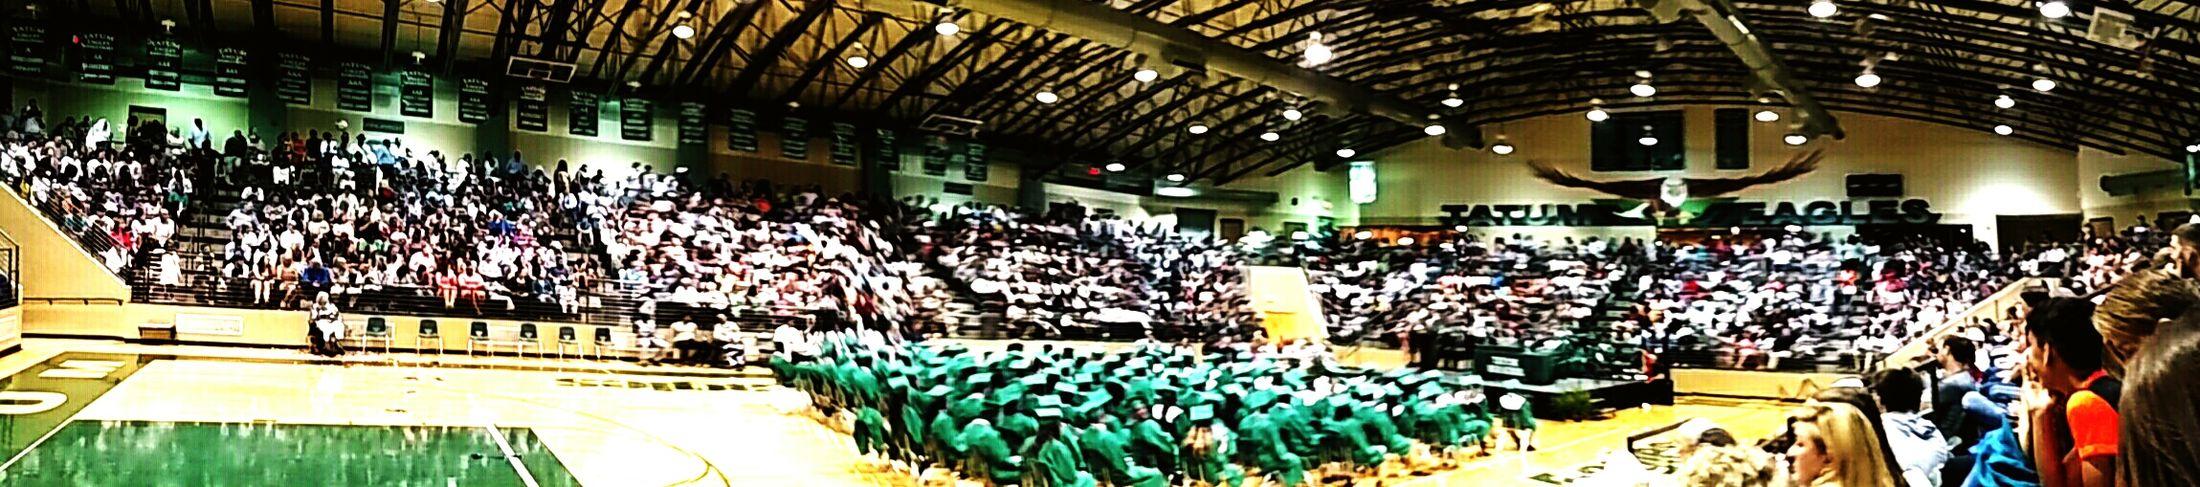 2016 Graduation Tatum High School Memories Christian Kustomz Portrait Getting Inspired Heart Panaramic Eagle Coliseum Coliseum Check This Out